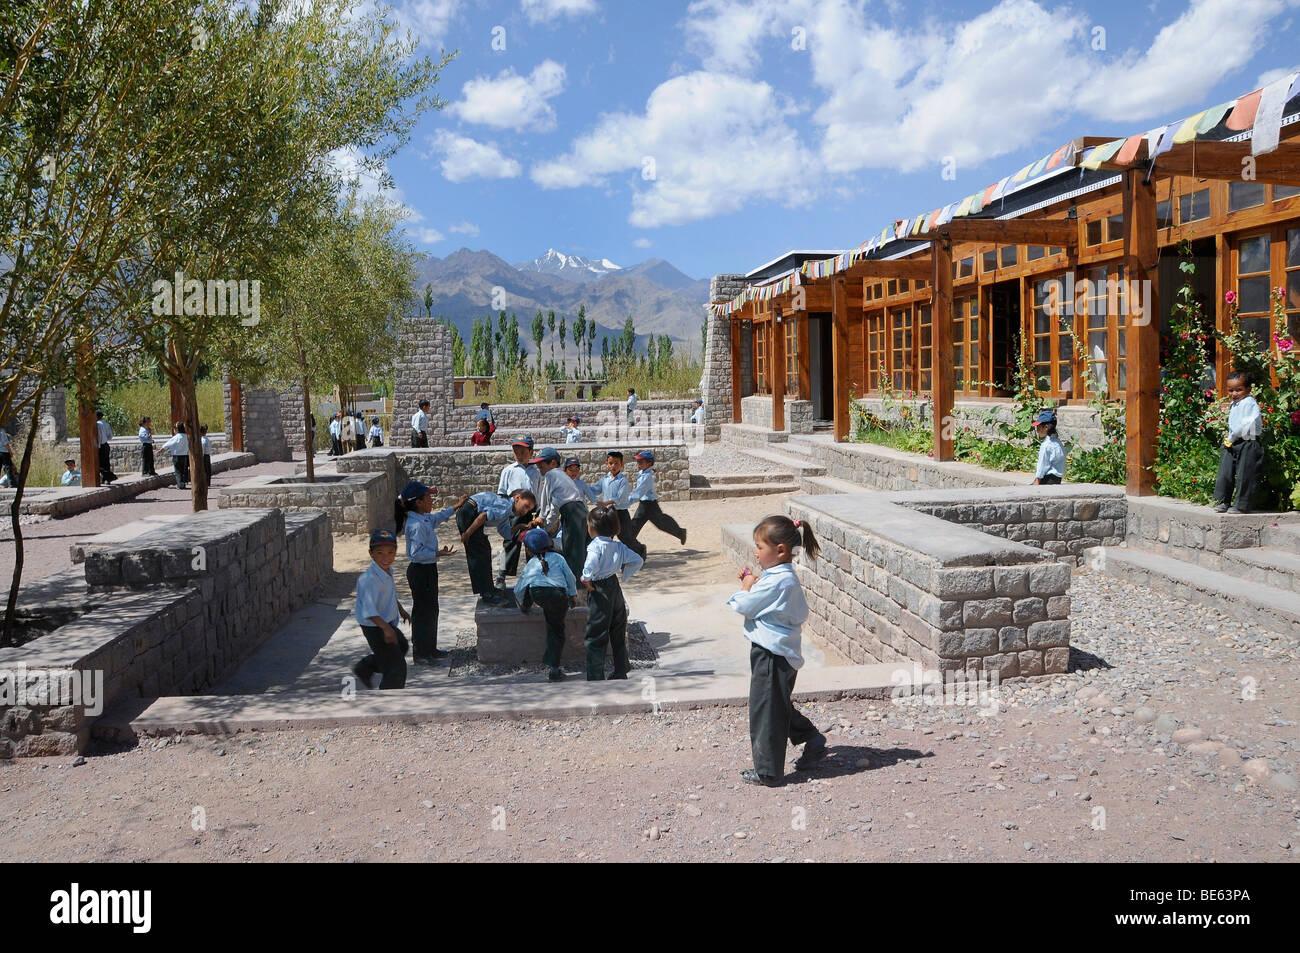 Elementary school children in the modern playground of the private-religious Druk White Lotus School, Shey, Ladakh, - Stock Image